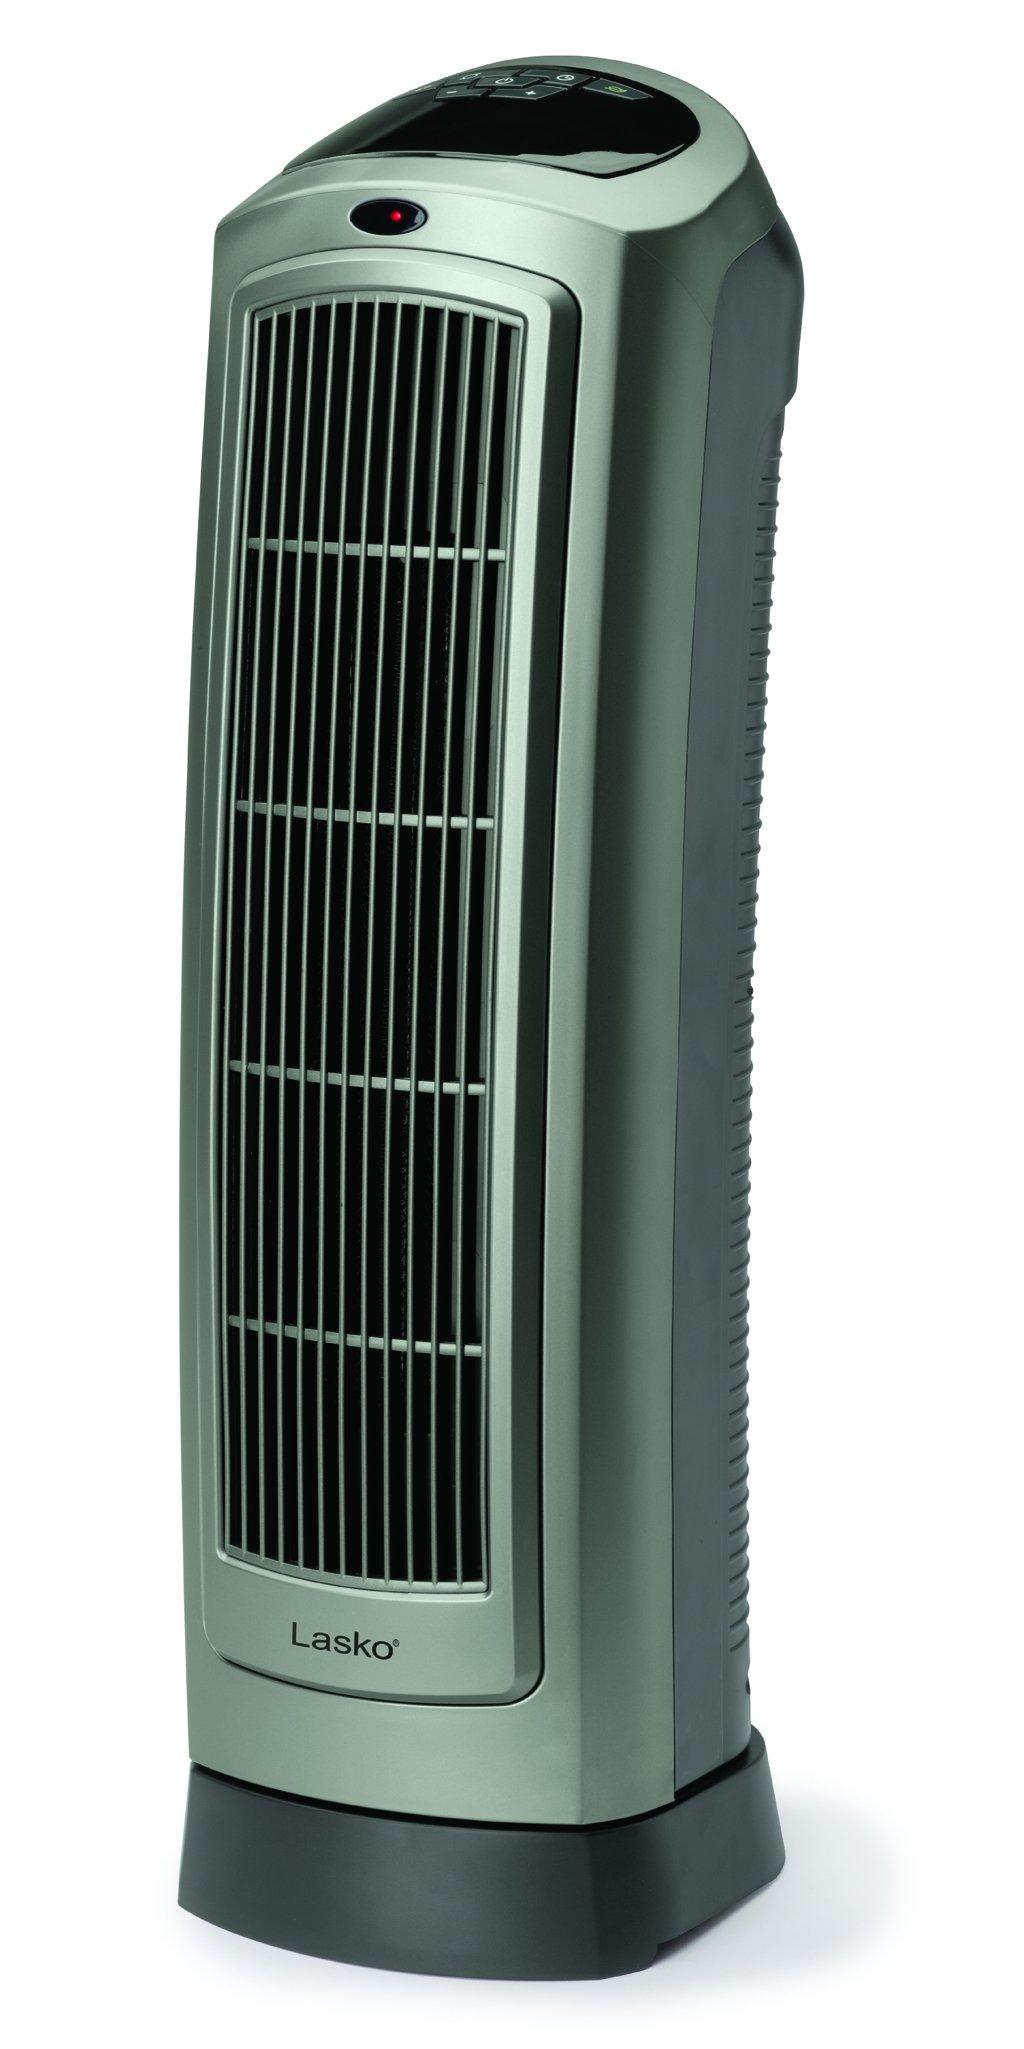 Lasko 5538 Ceramic Tower Heater With Remote Control Ebay